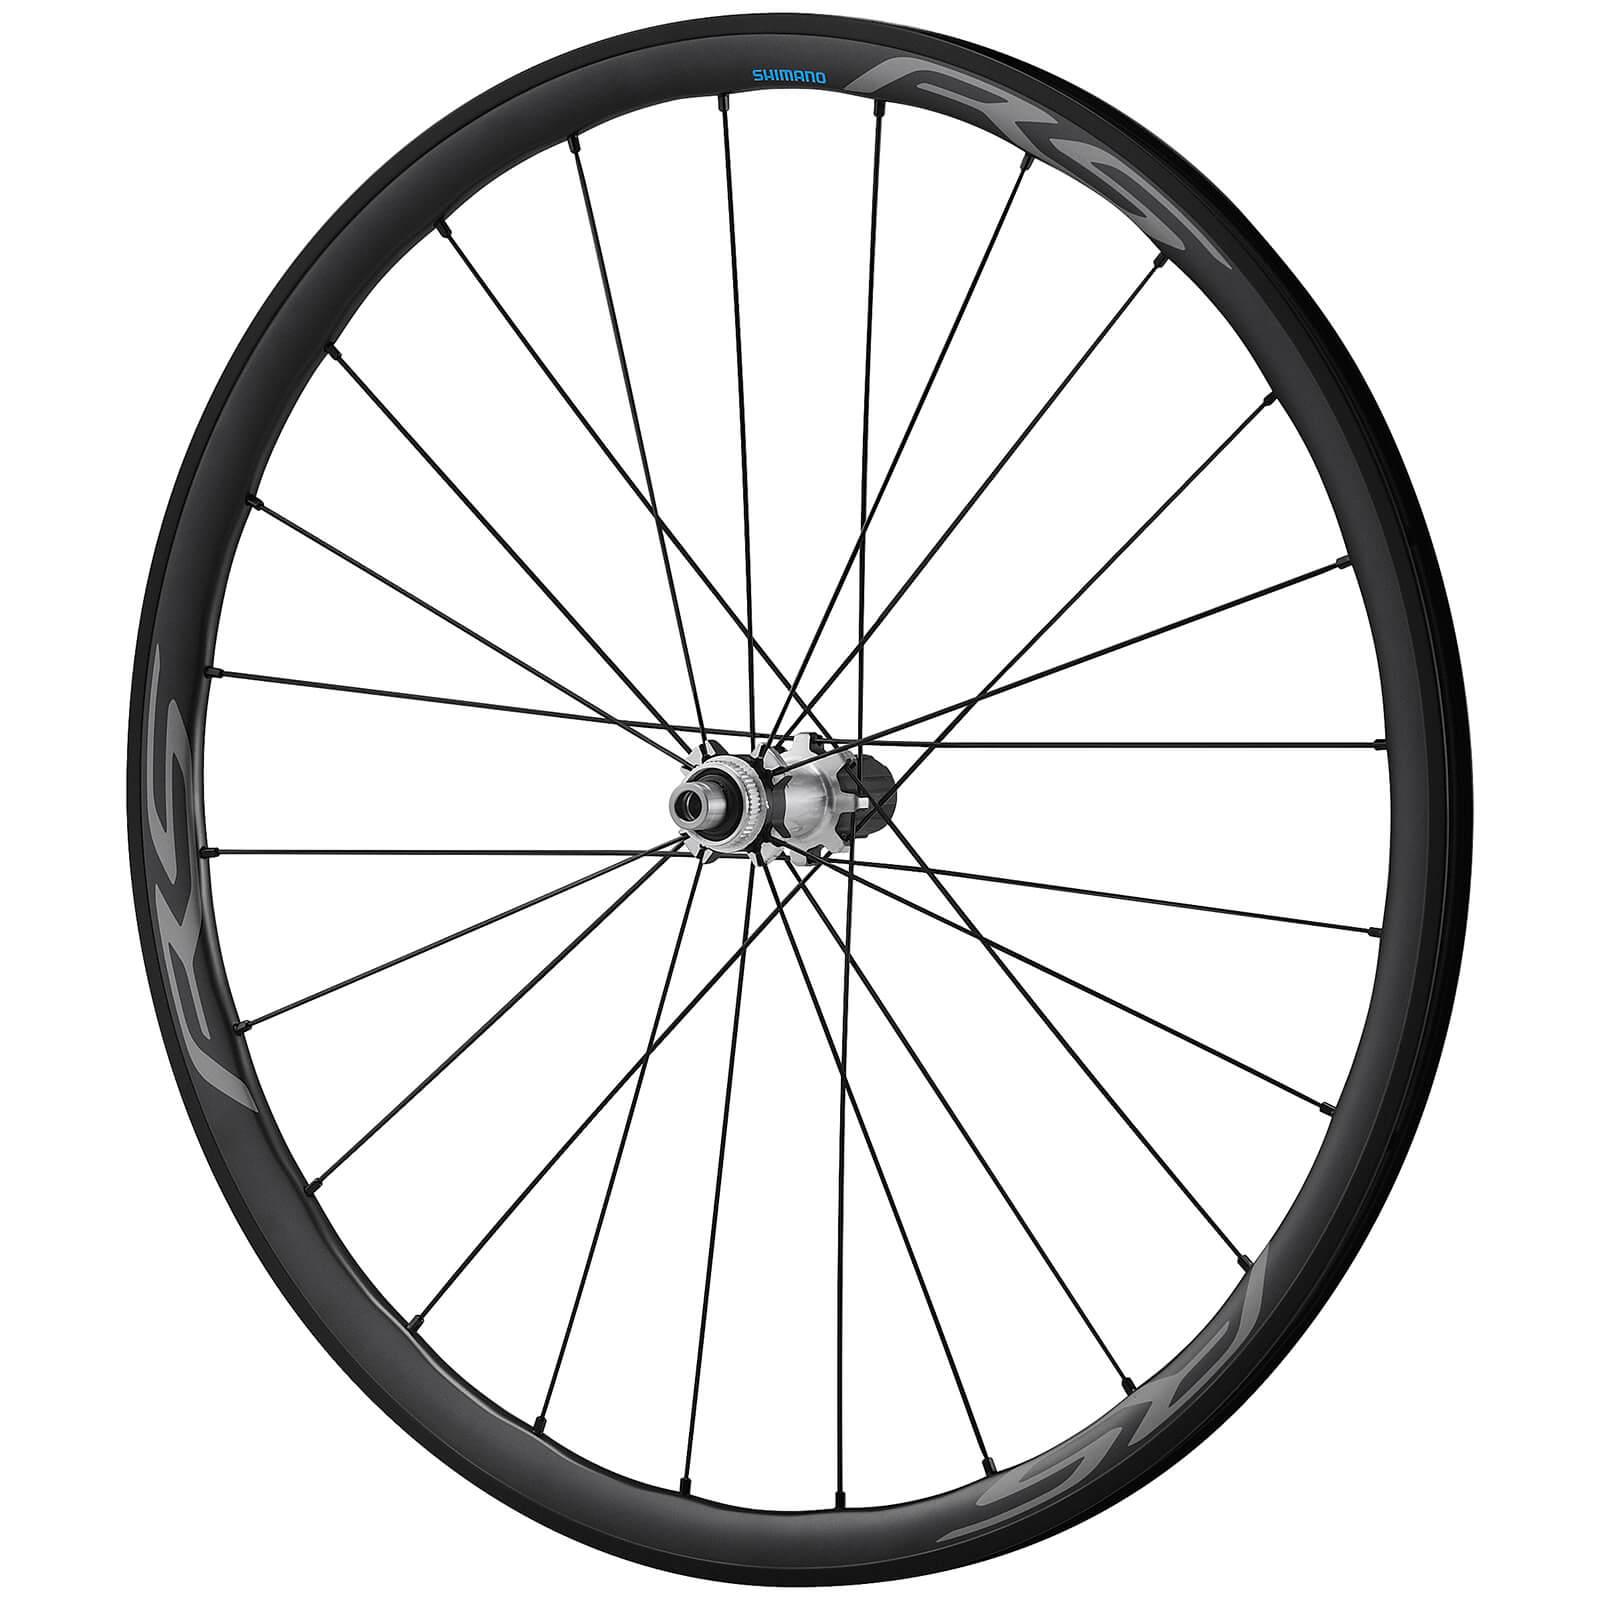 Shimano Ultegra RS770 C30 Tubeless Disc Rear Wheel